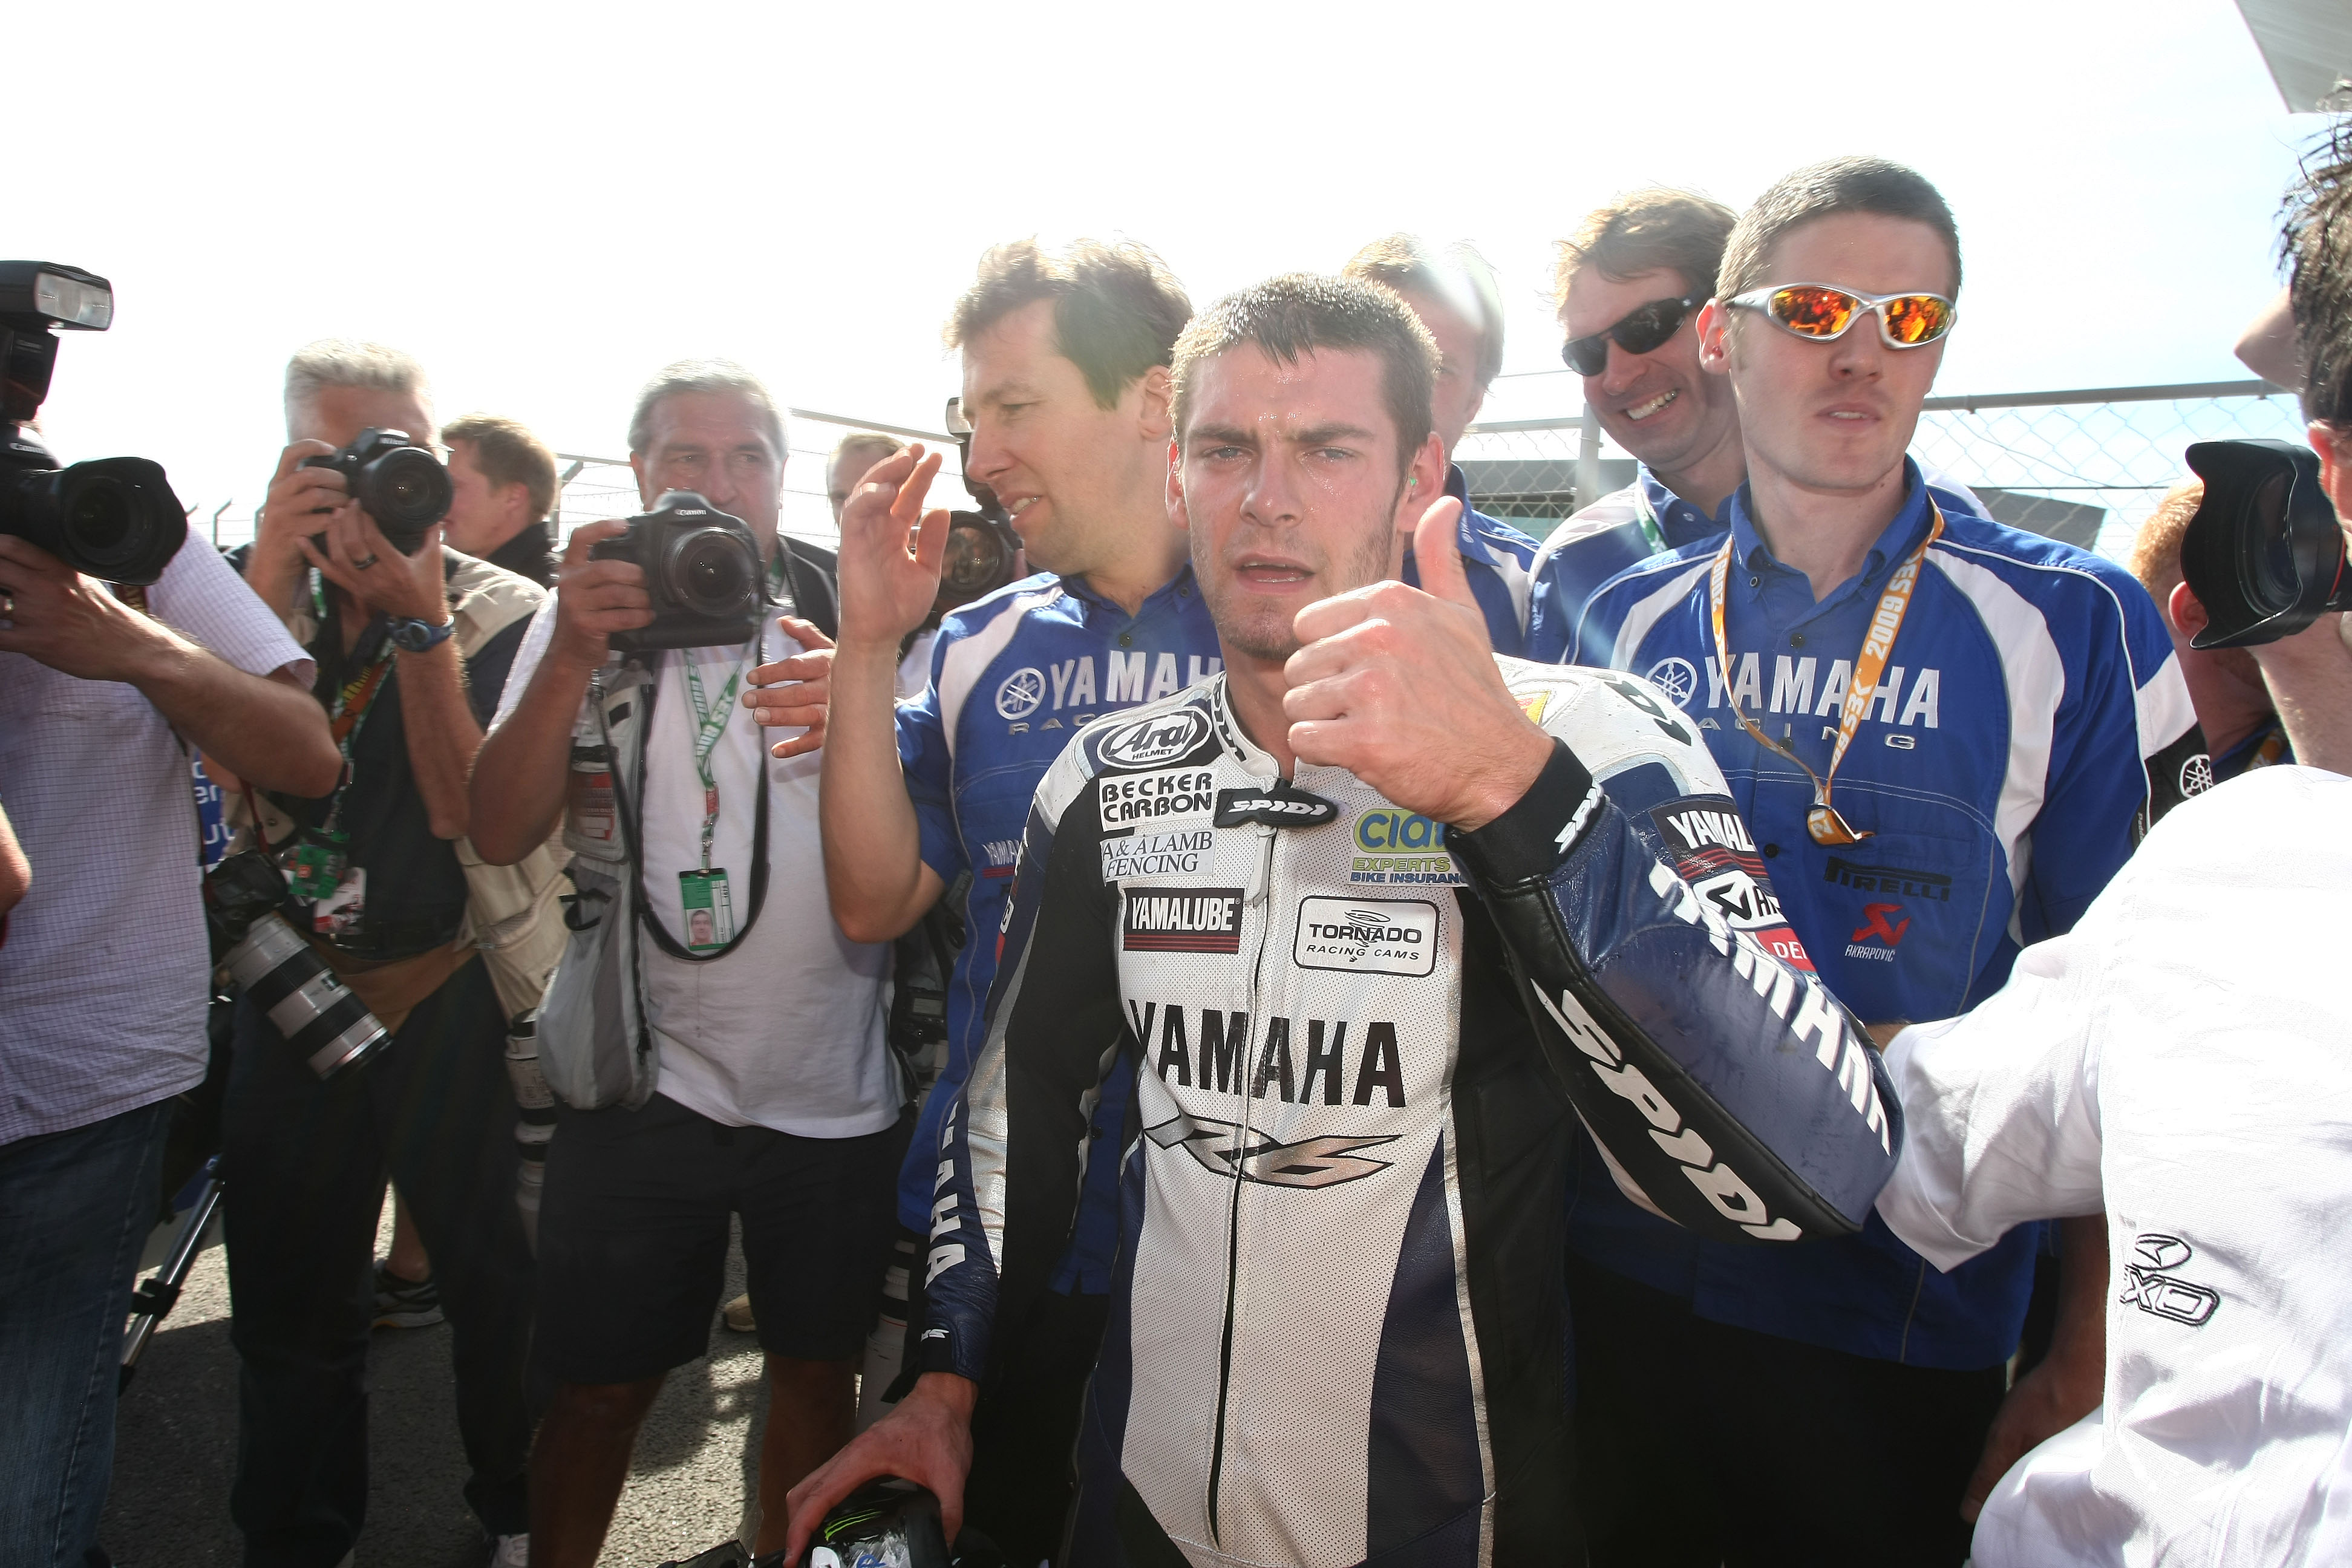 Cal Crutchlow wins 2009 World Supersport title